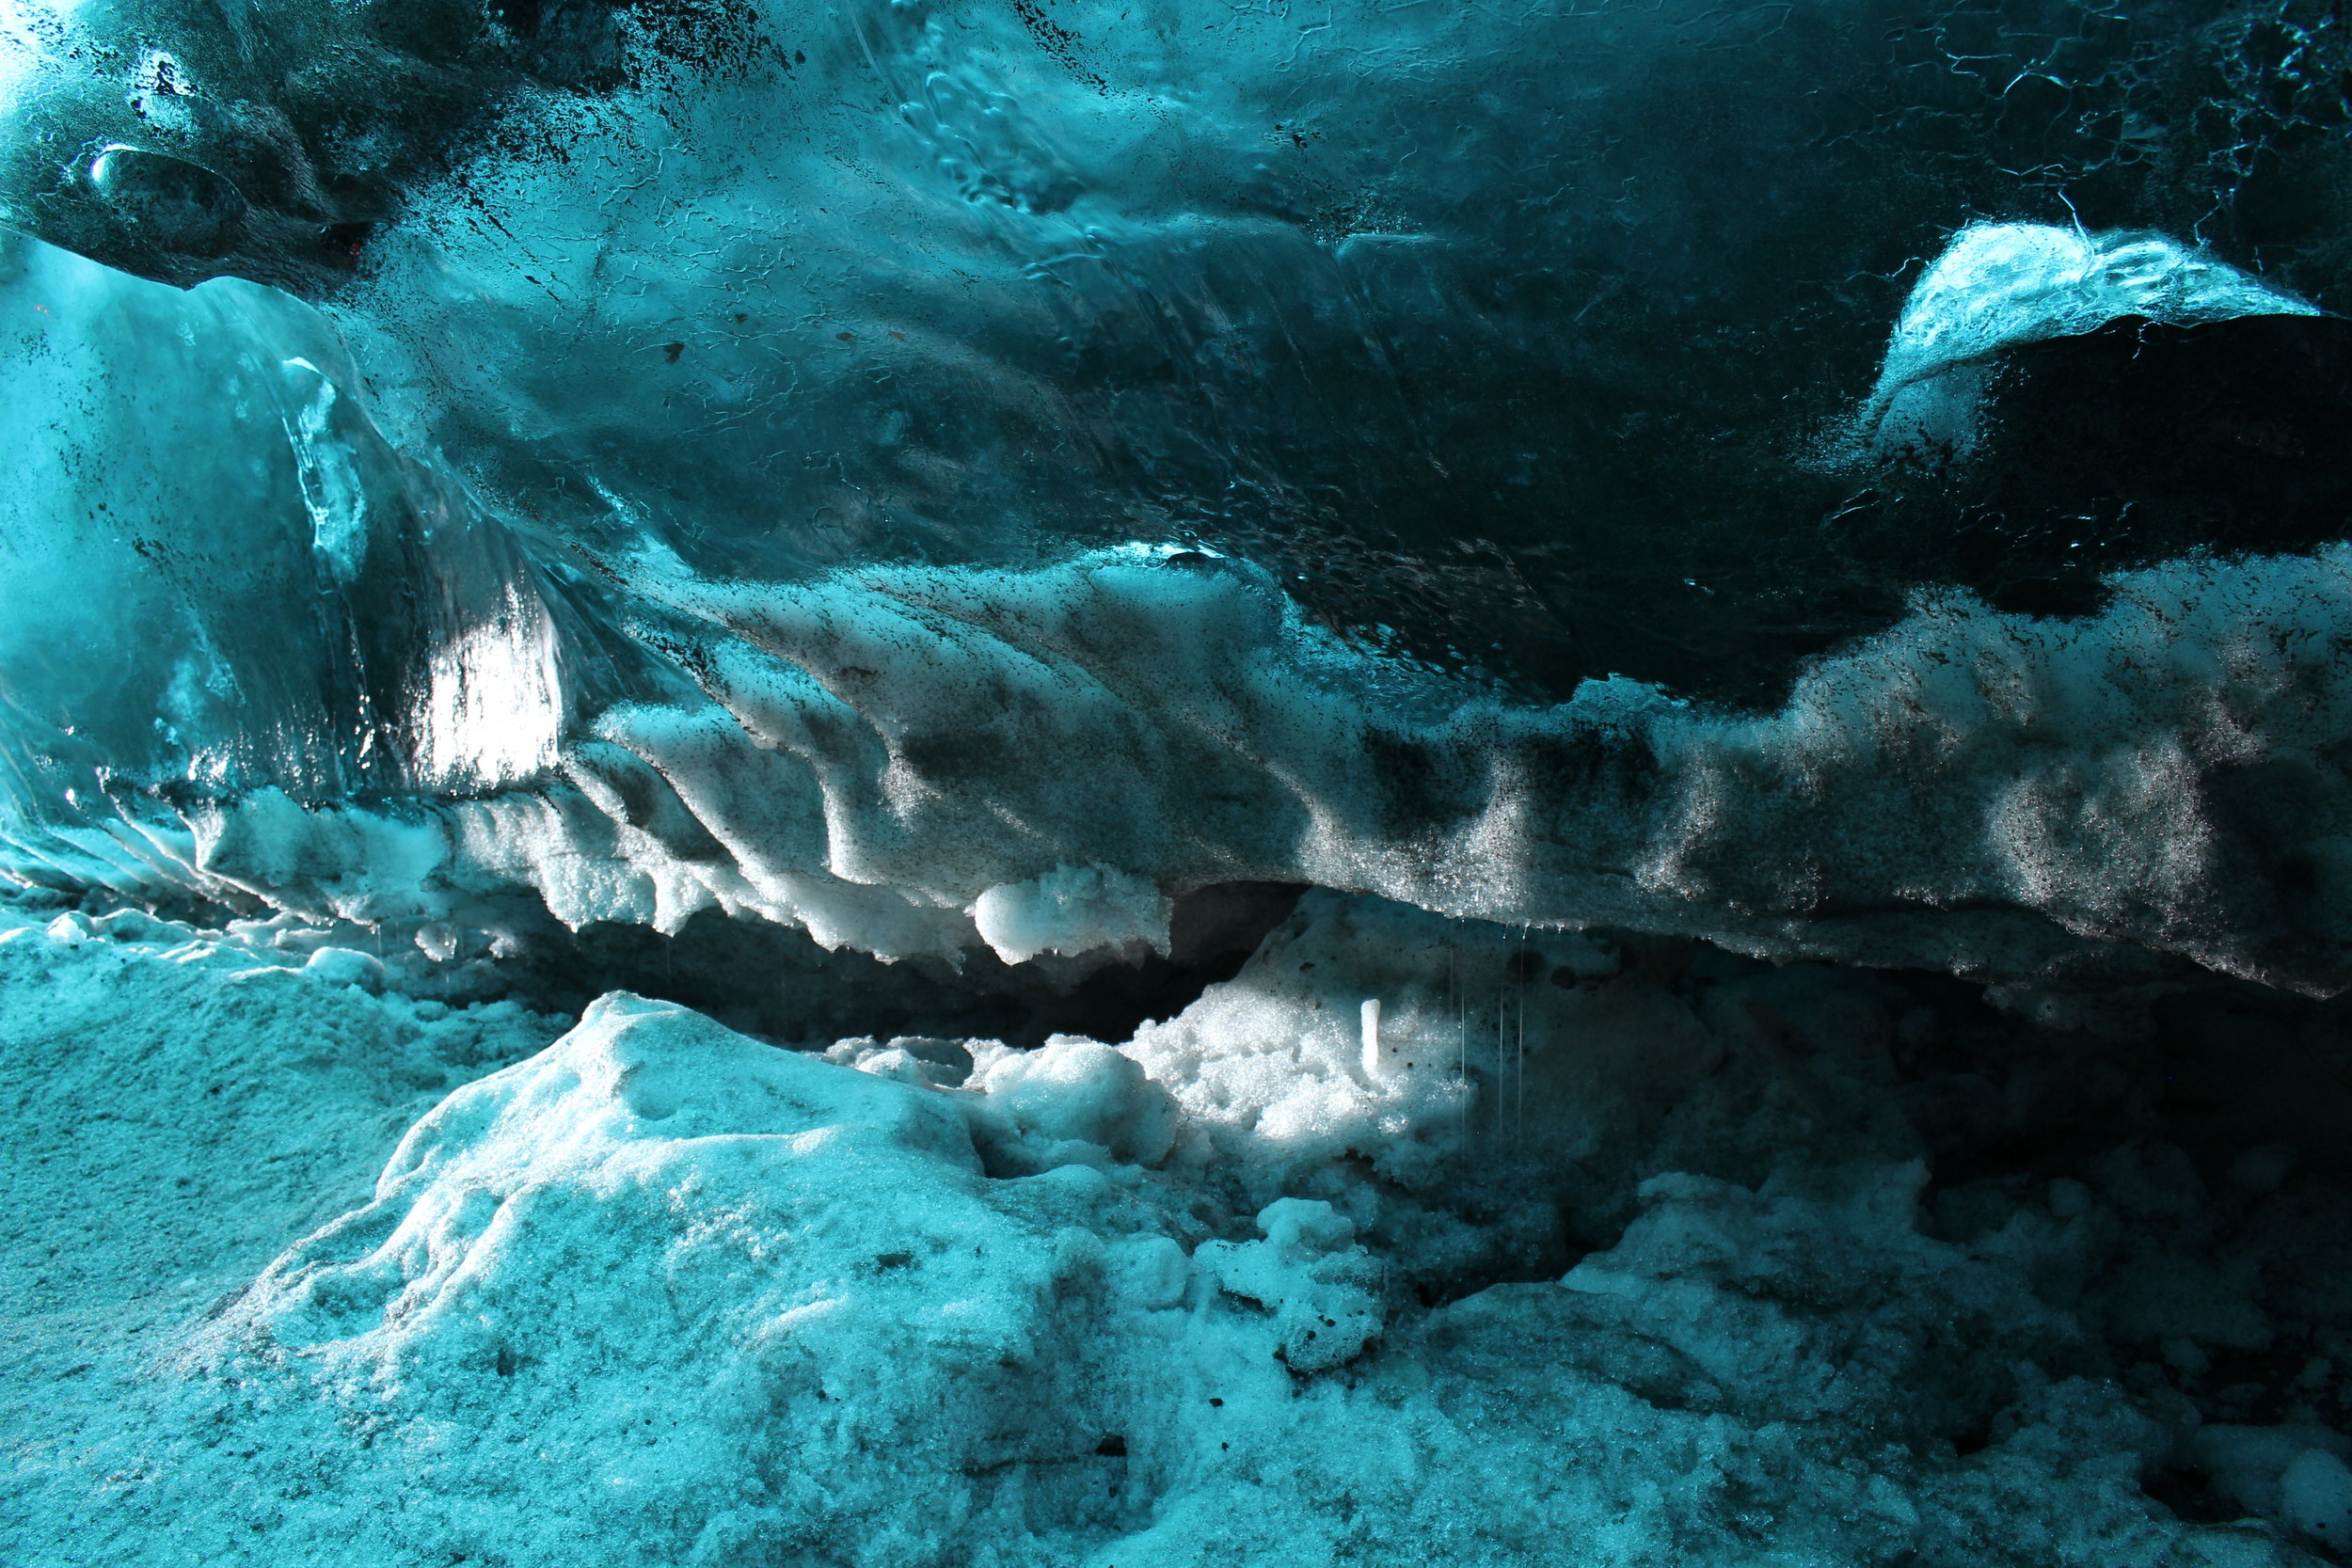 Crystal Ice Cave, Breiðarmerkurjökull